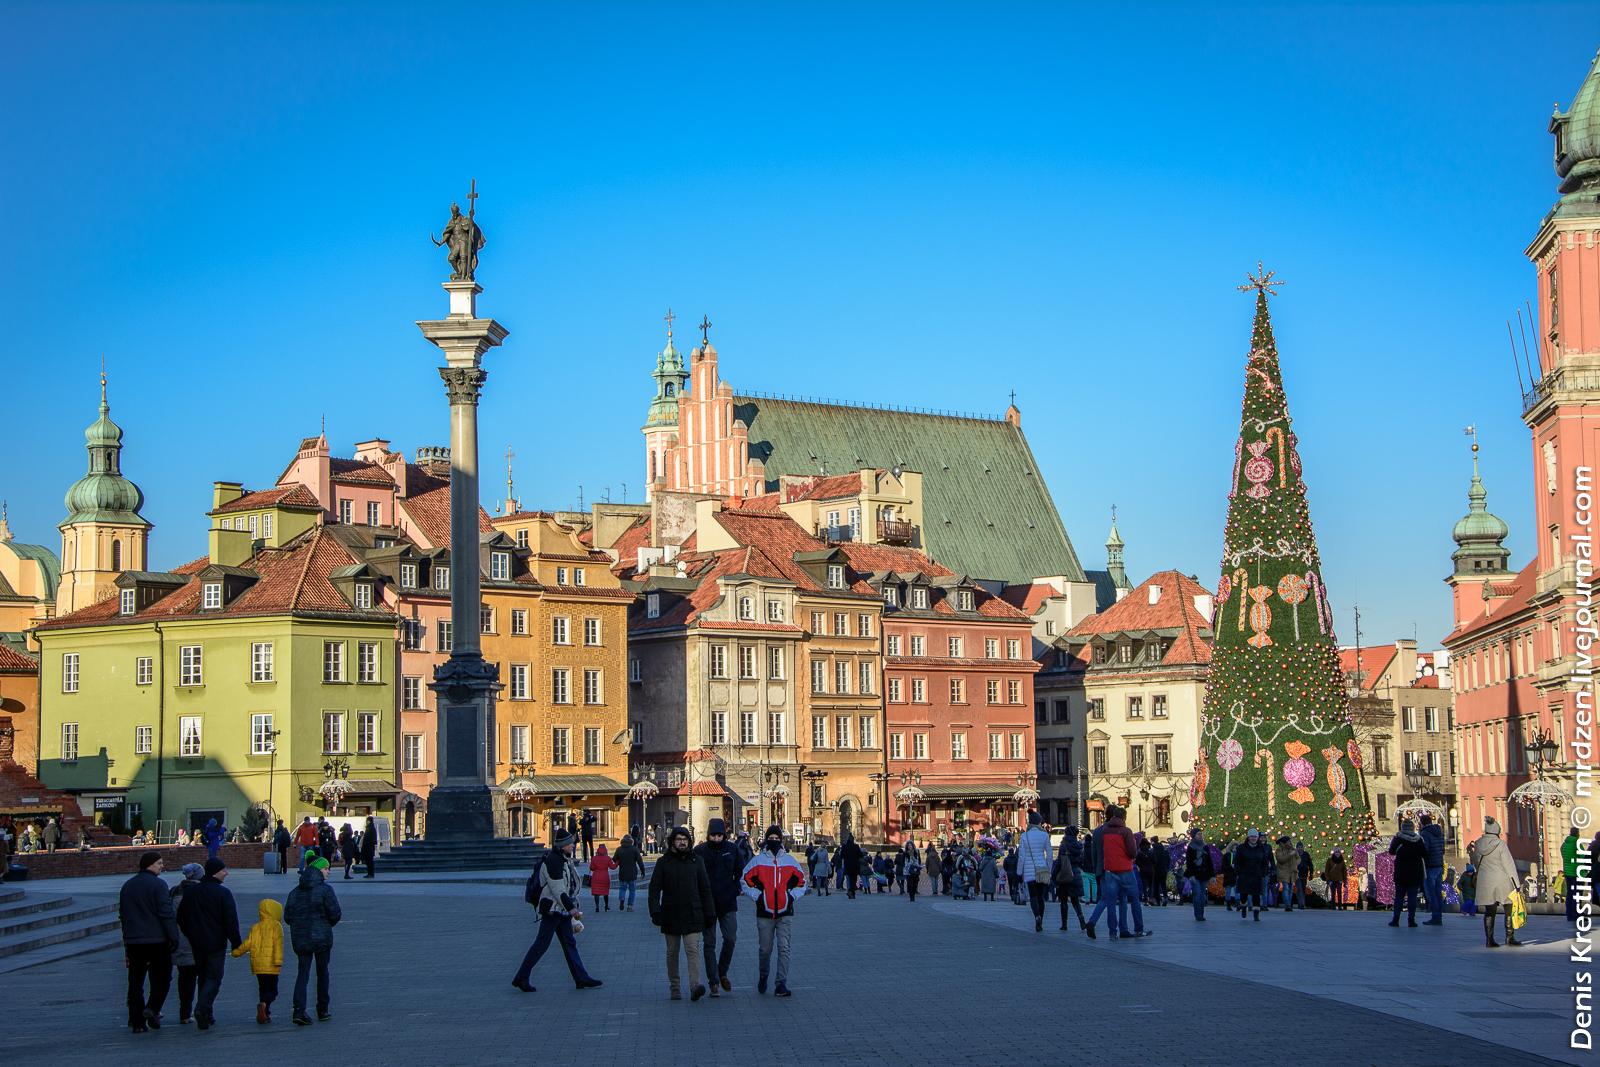 Варшава. Старый город. Замковая площадь.